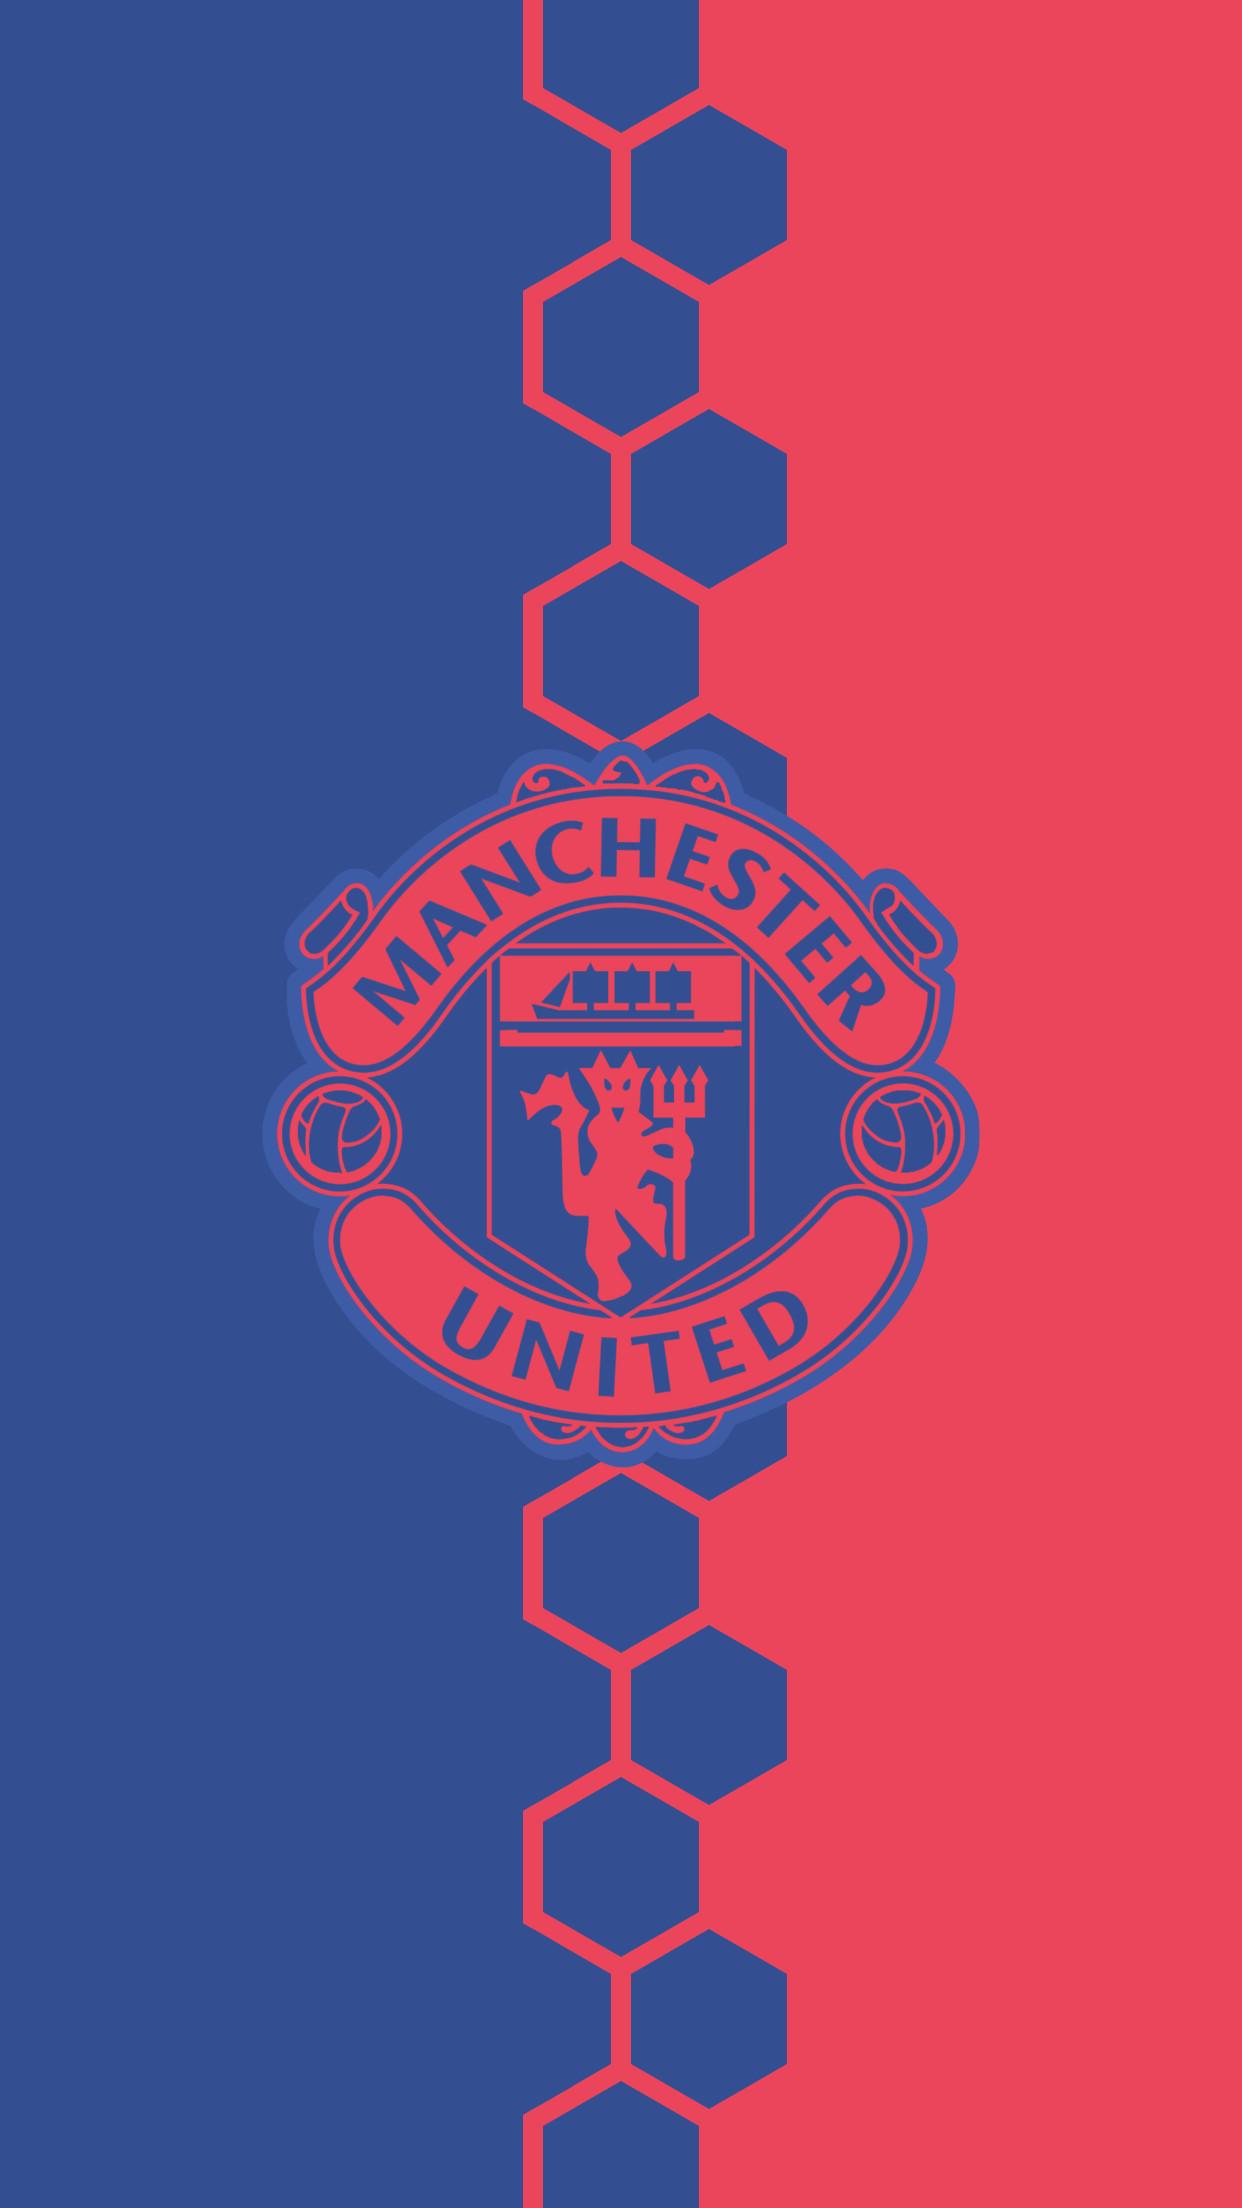 Football Wallpaper, Man United, Mobile Wallpaper, Premier League,  Manchester United, Basil, Iphone 6, Soccer, Martial Arts